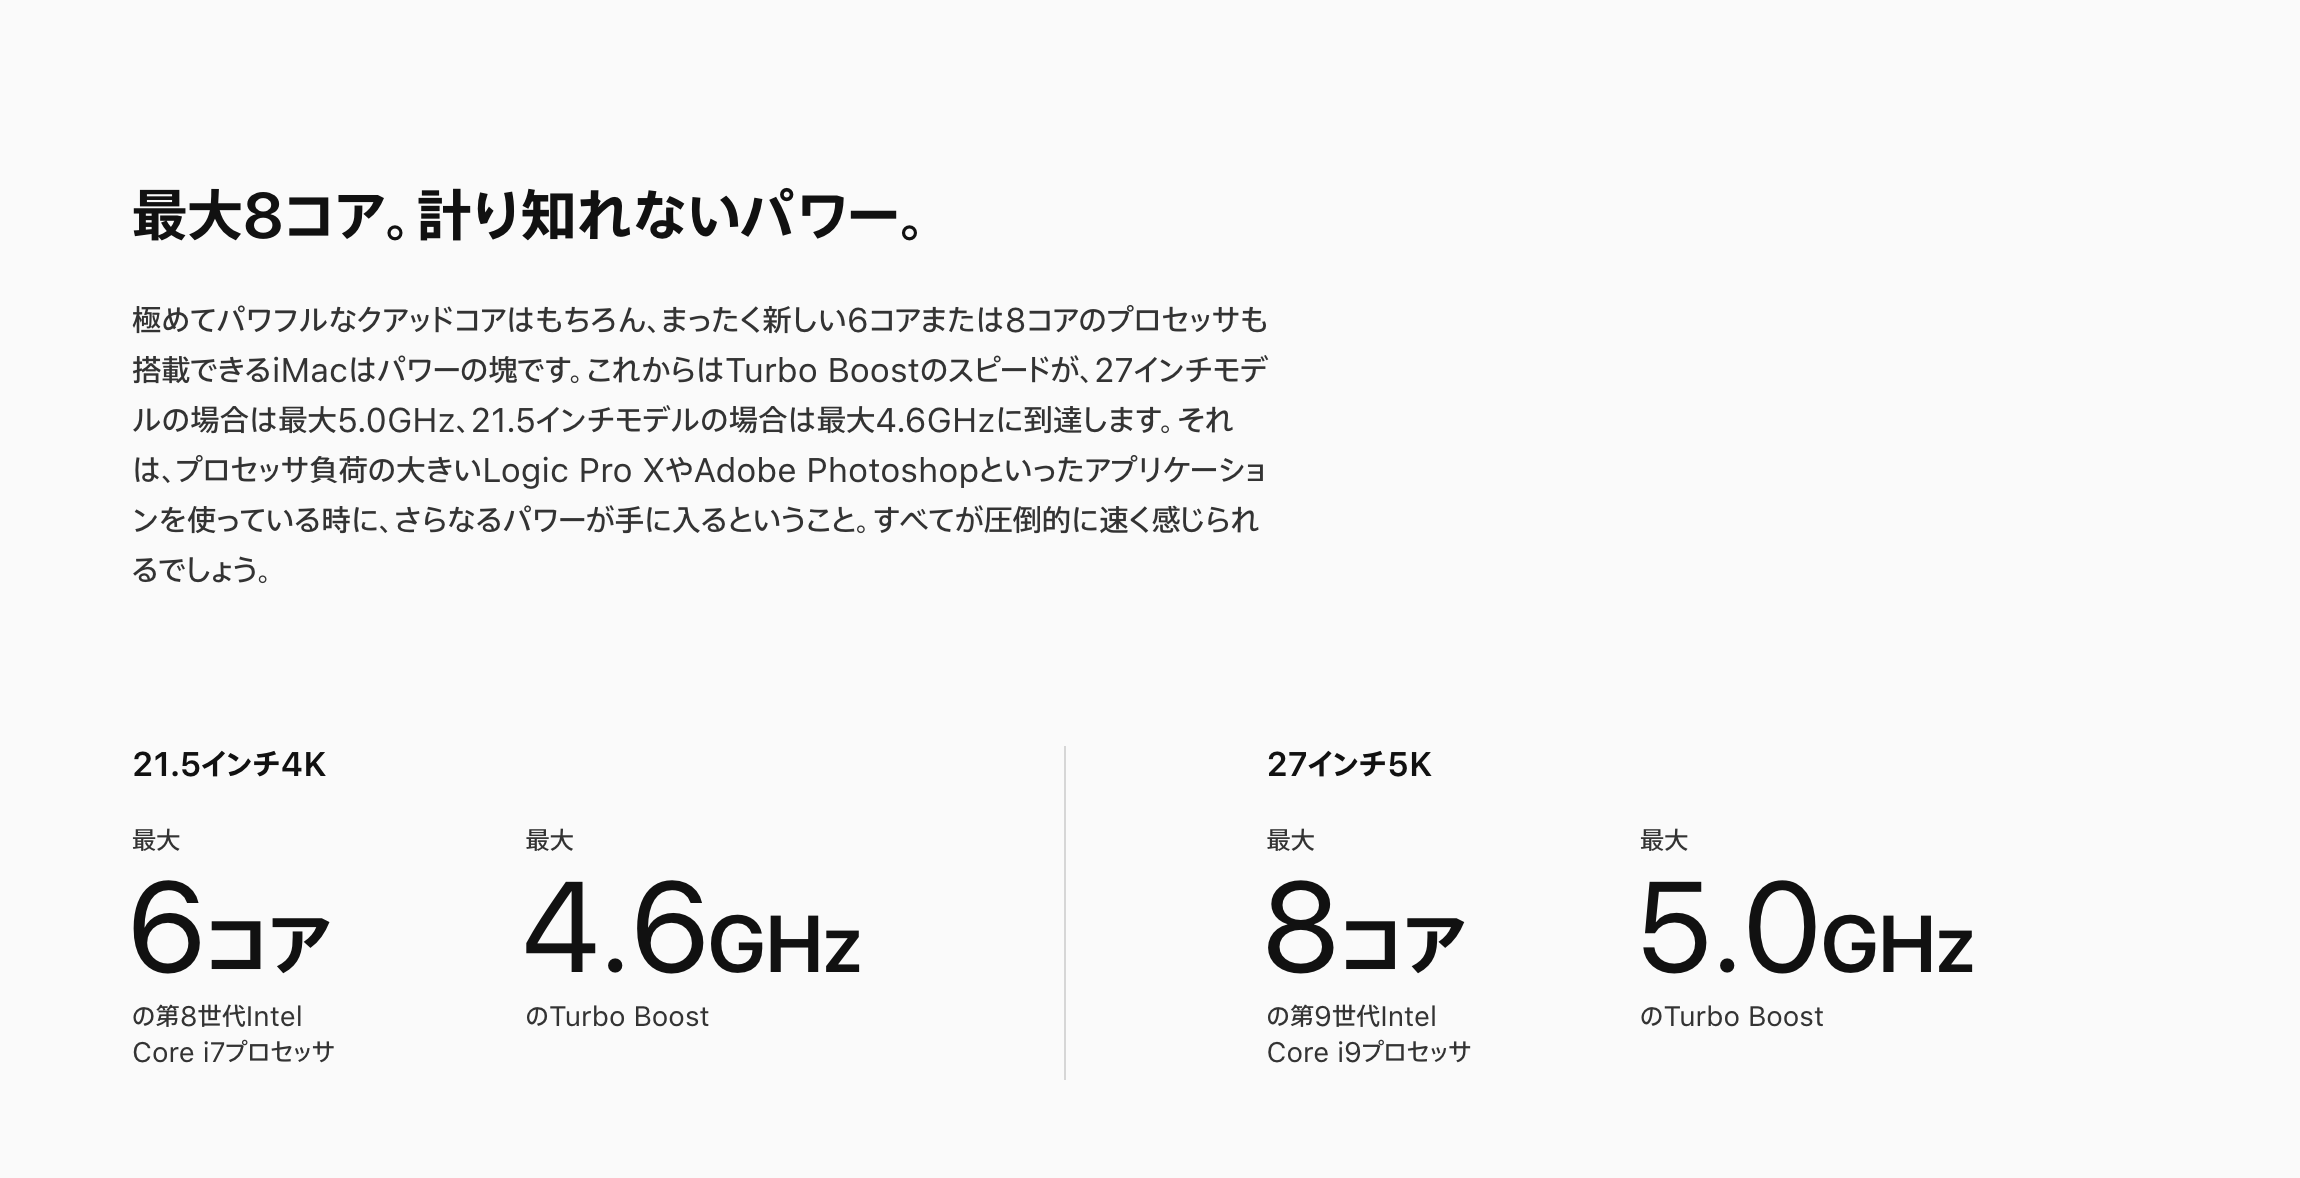 Apple(アップル) 新iMac 発表